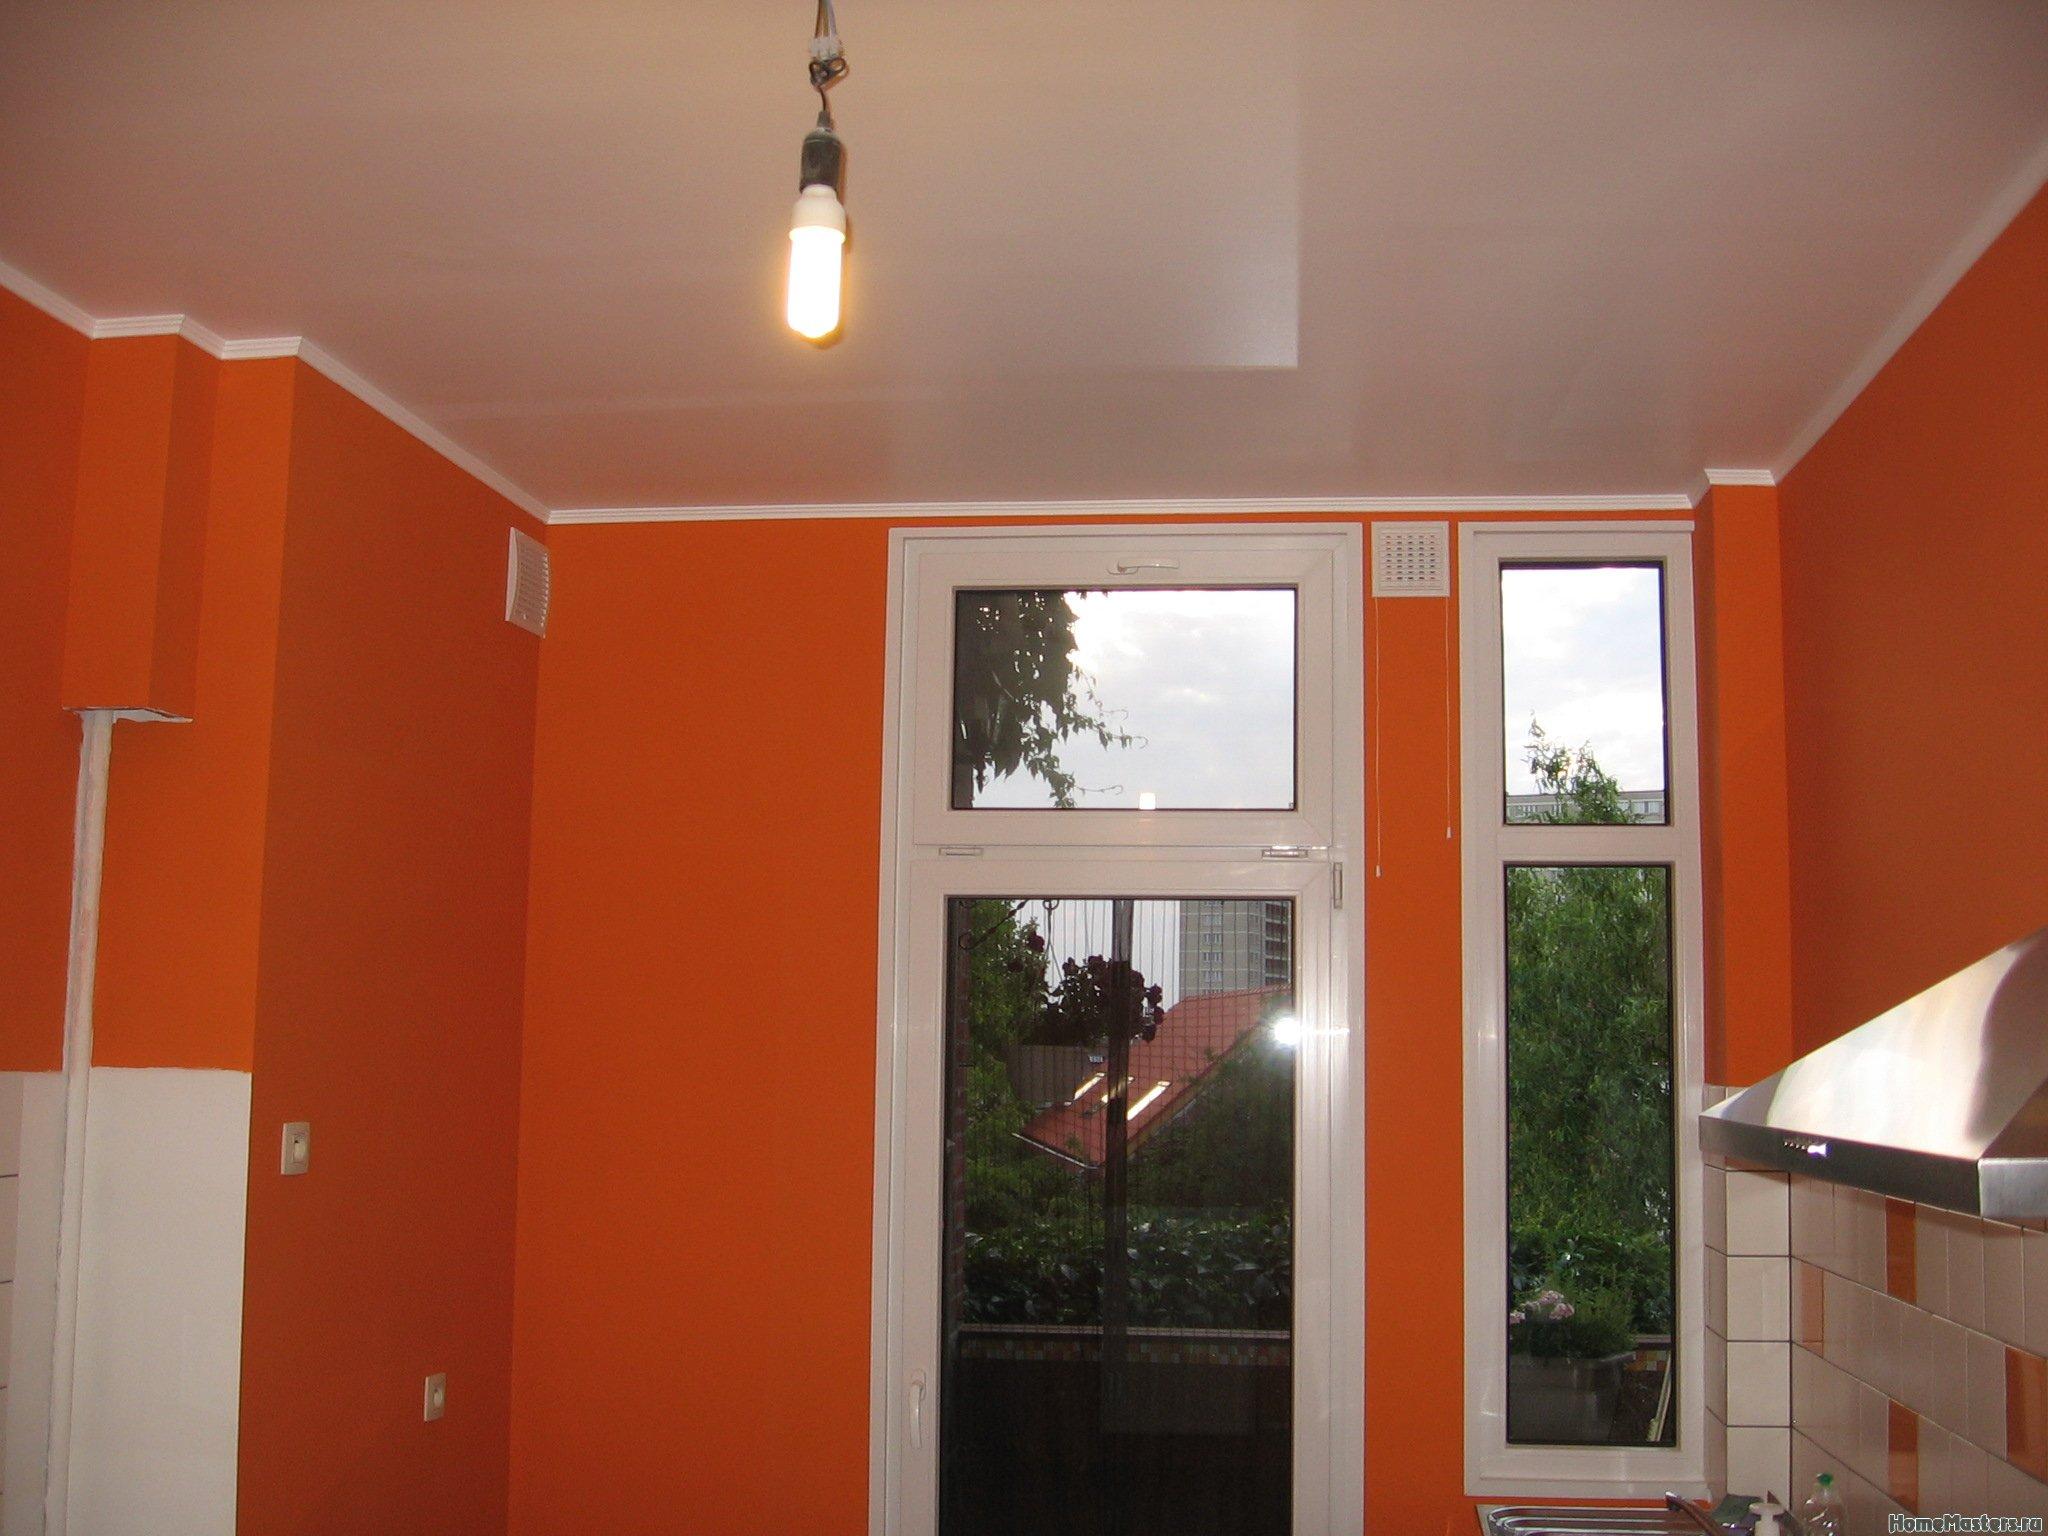 Ремонт на кухне. Стены, пол, электрика.